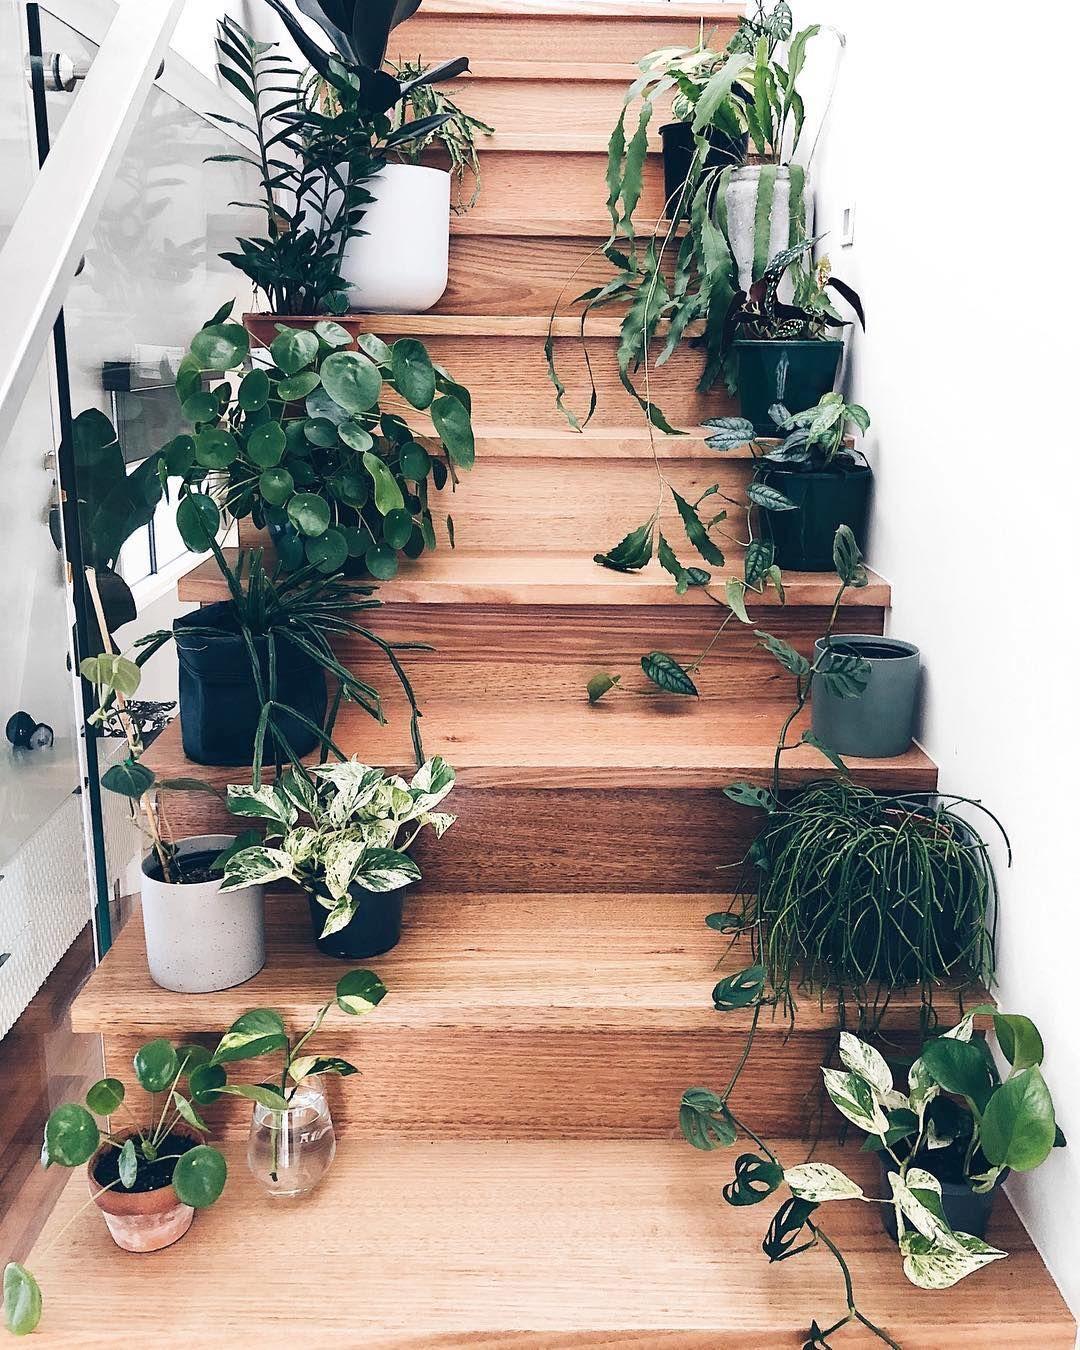 Plants On Stairs Plant Decor Ornamental Plants Plants